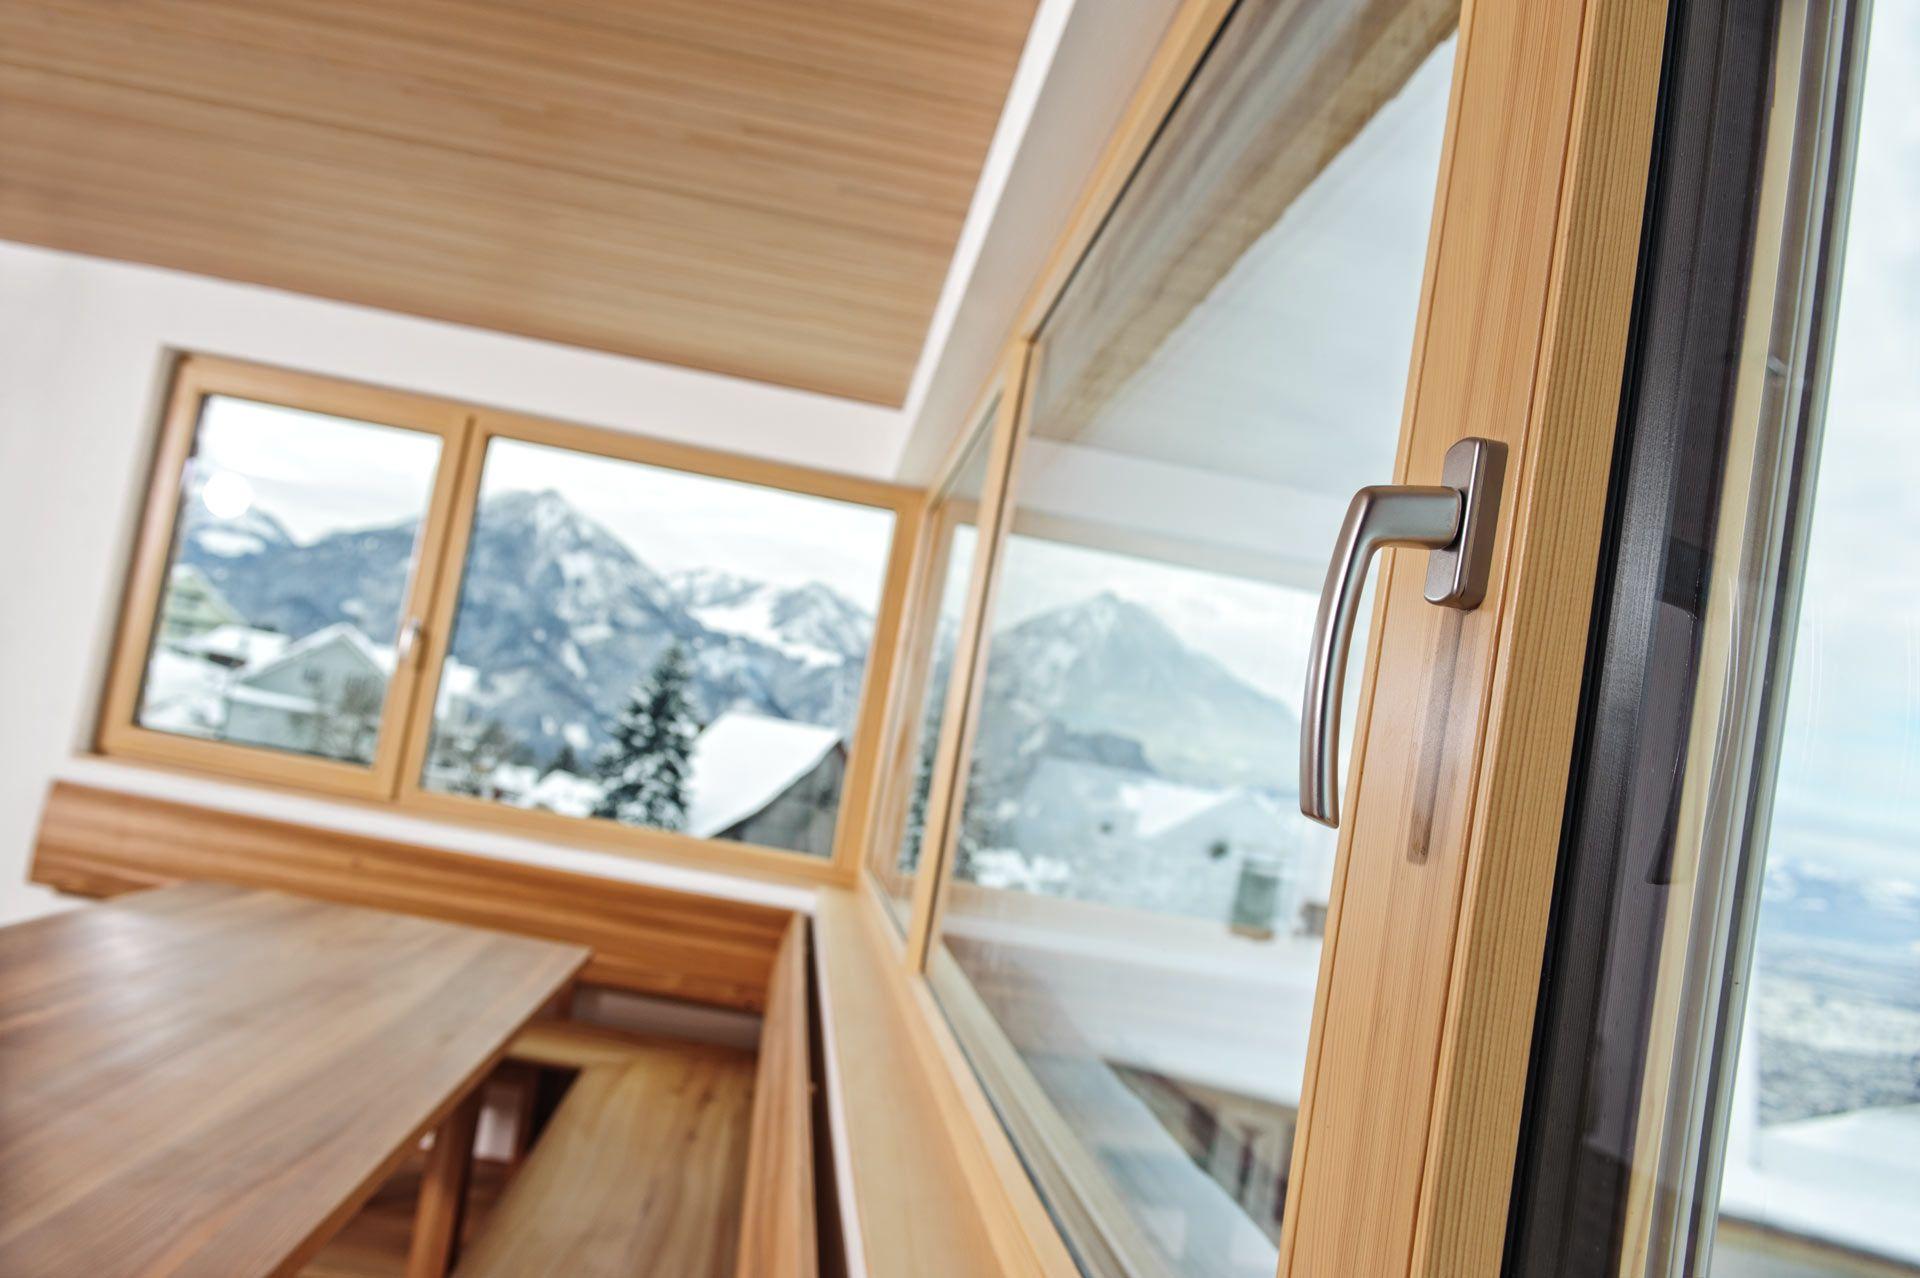 Wohndesign interieur badezimmer holz oder kunststofffenster  wood chisel sandpaper and door handles